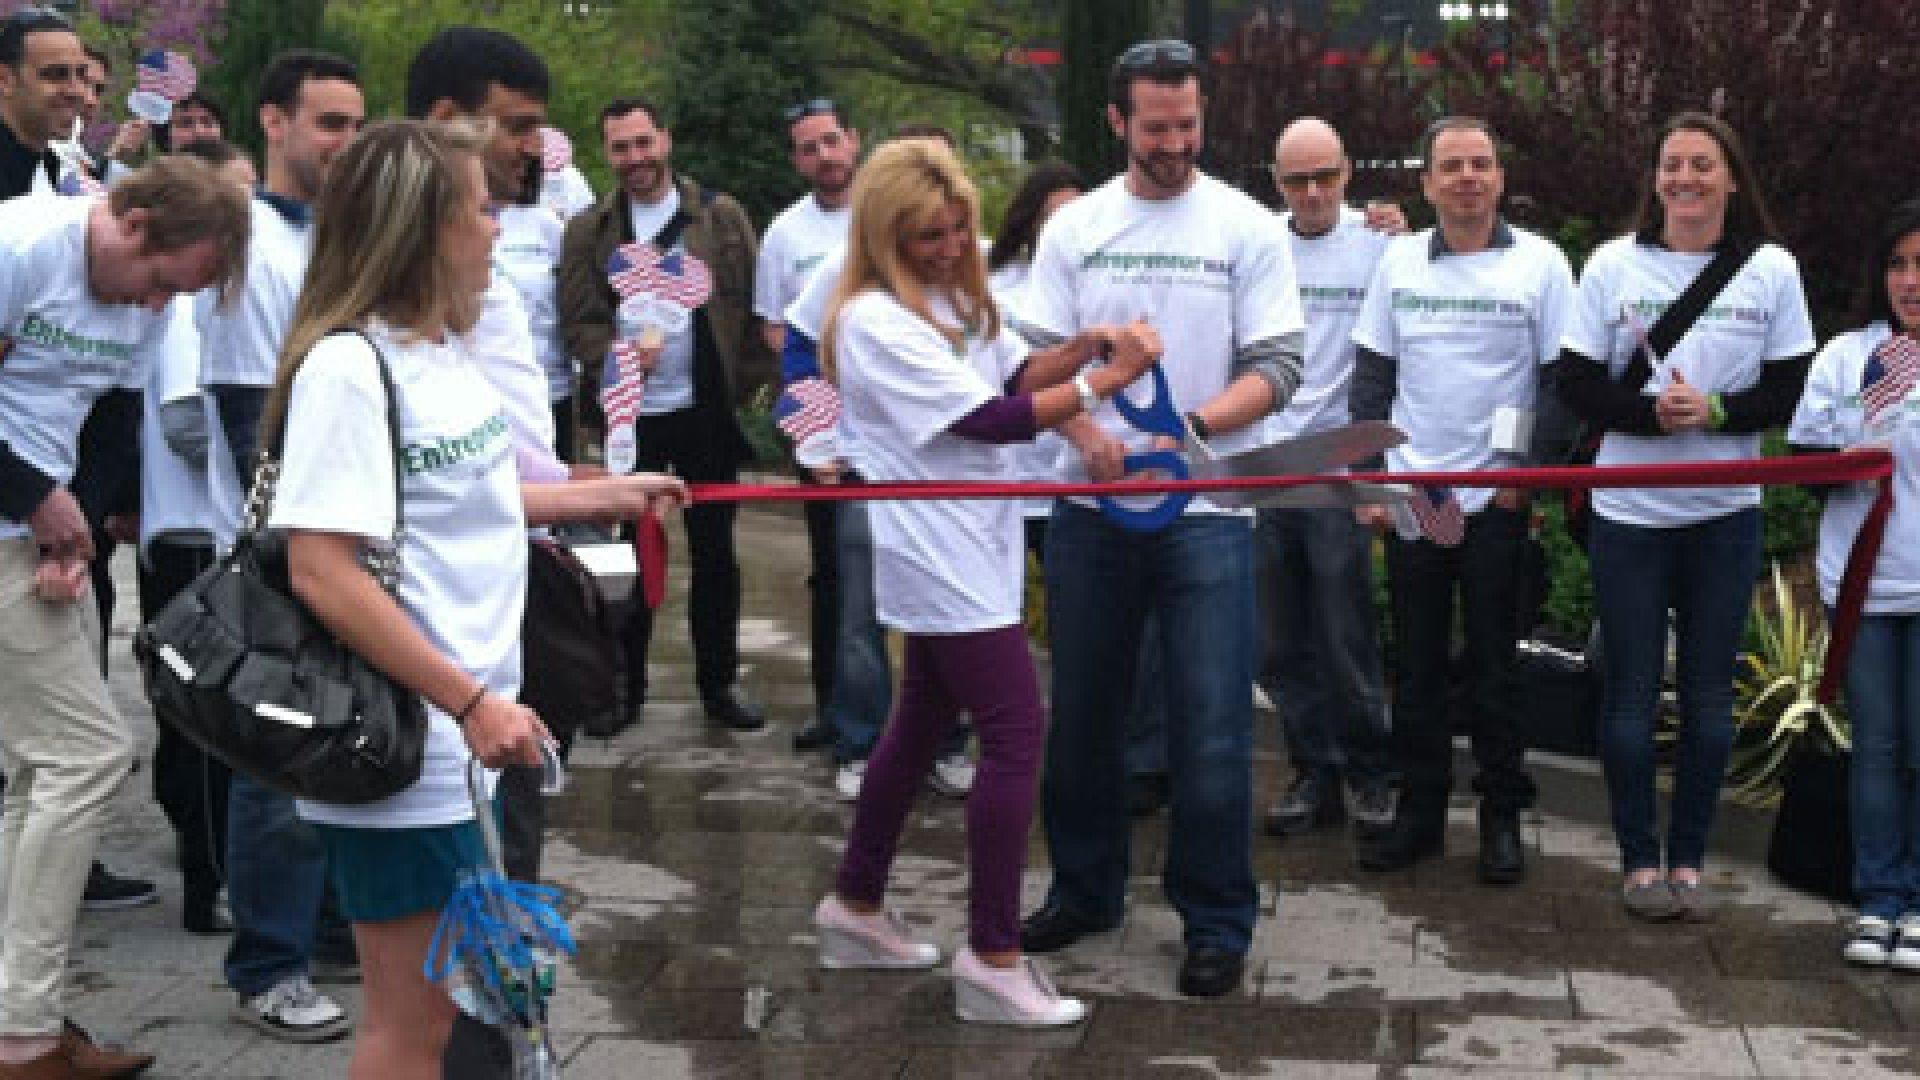 Amilya Antonetti and Gary Whitehill kick off Entrepreneur Walk with a ribbon-cutting.